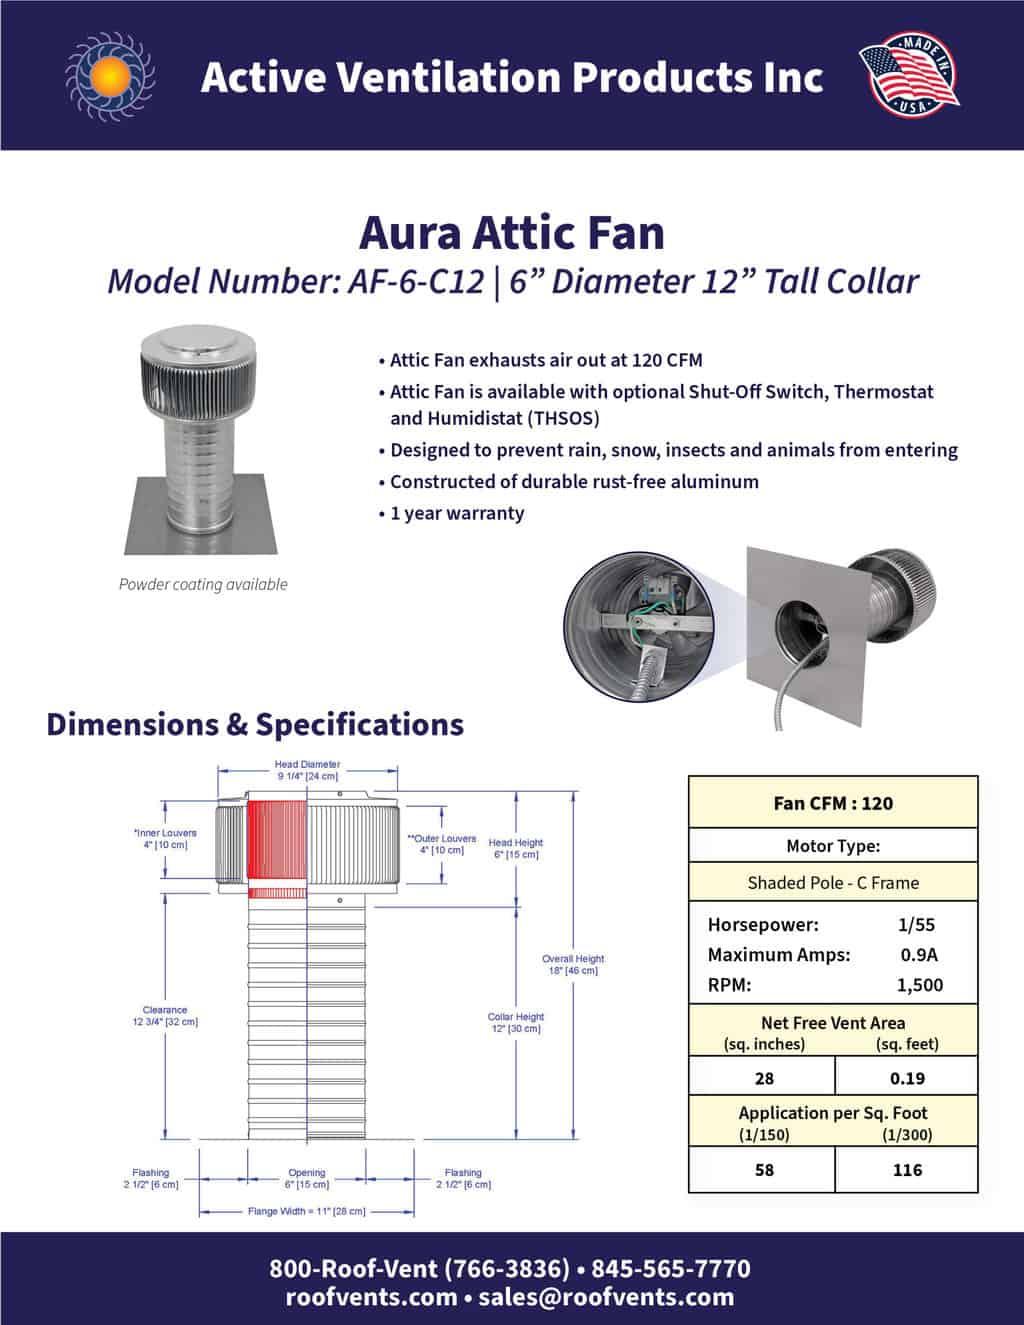 AF-6-C12-brochure An Exhaust Attic Fan